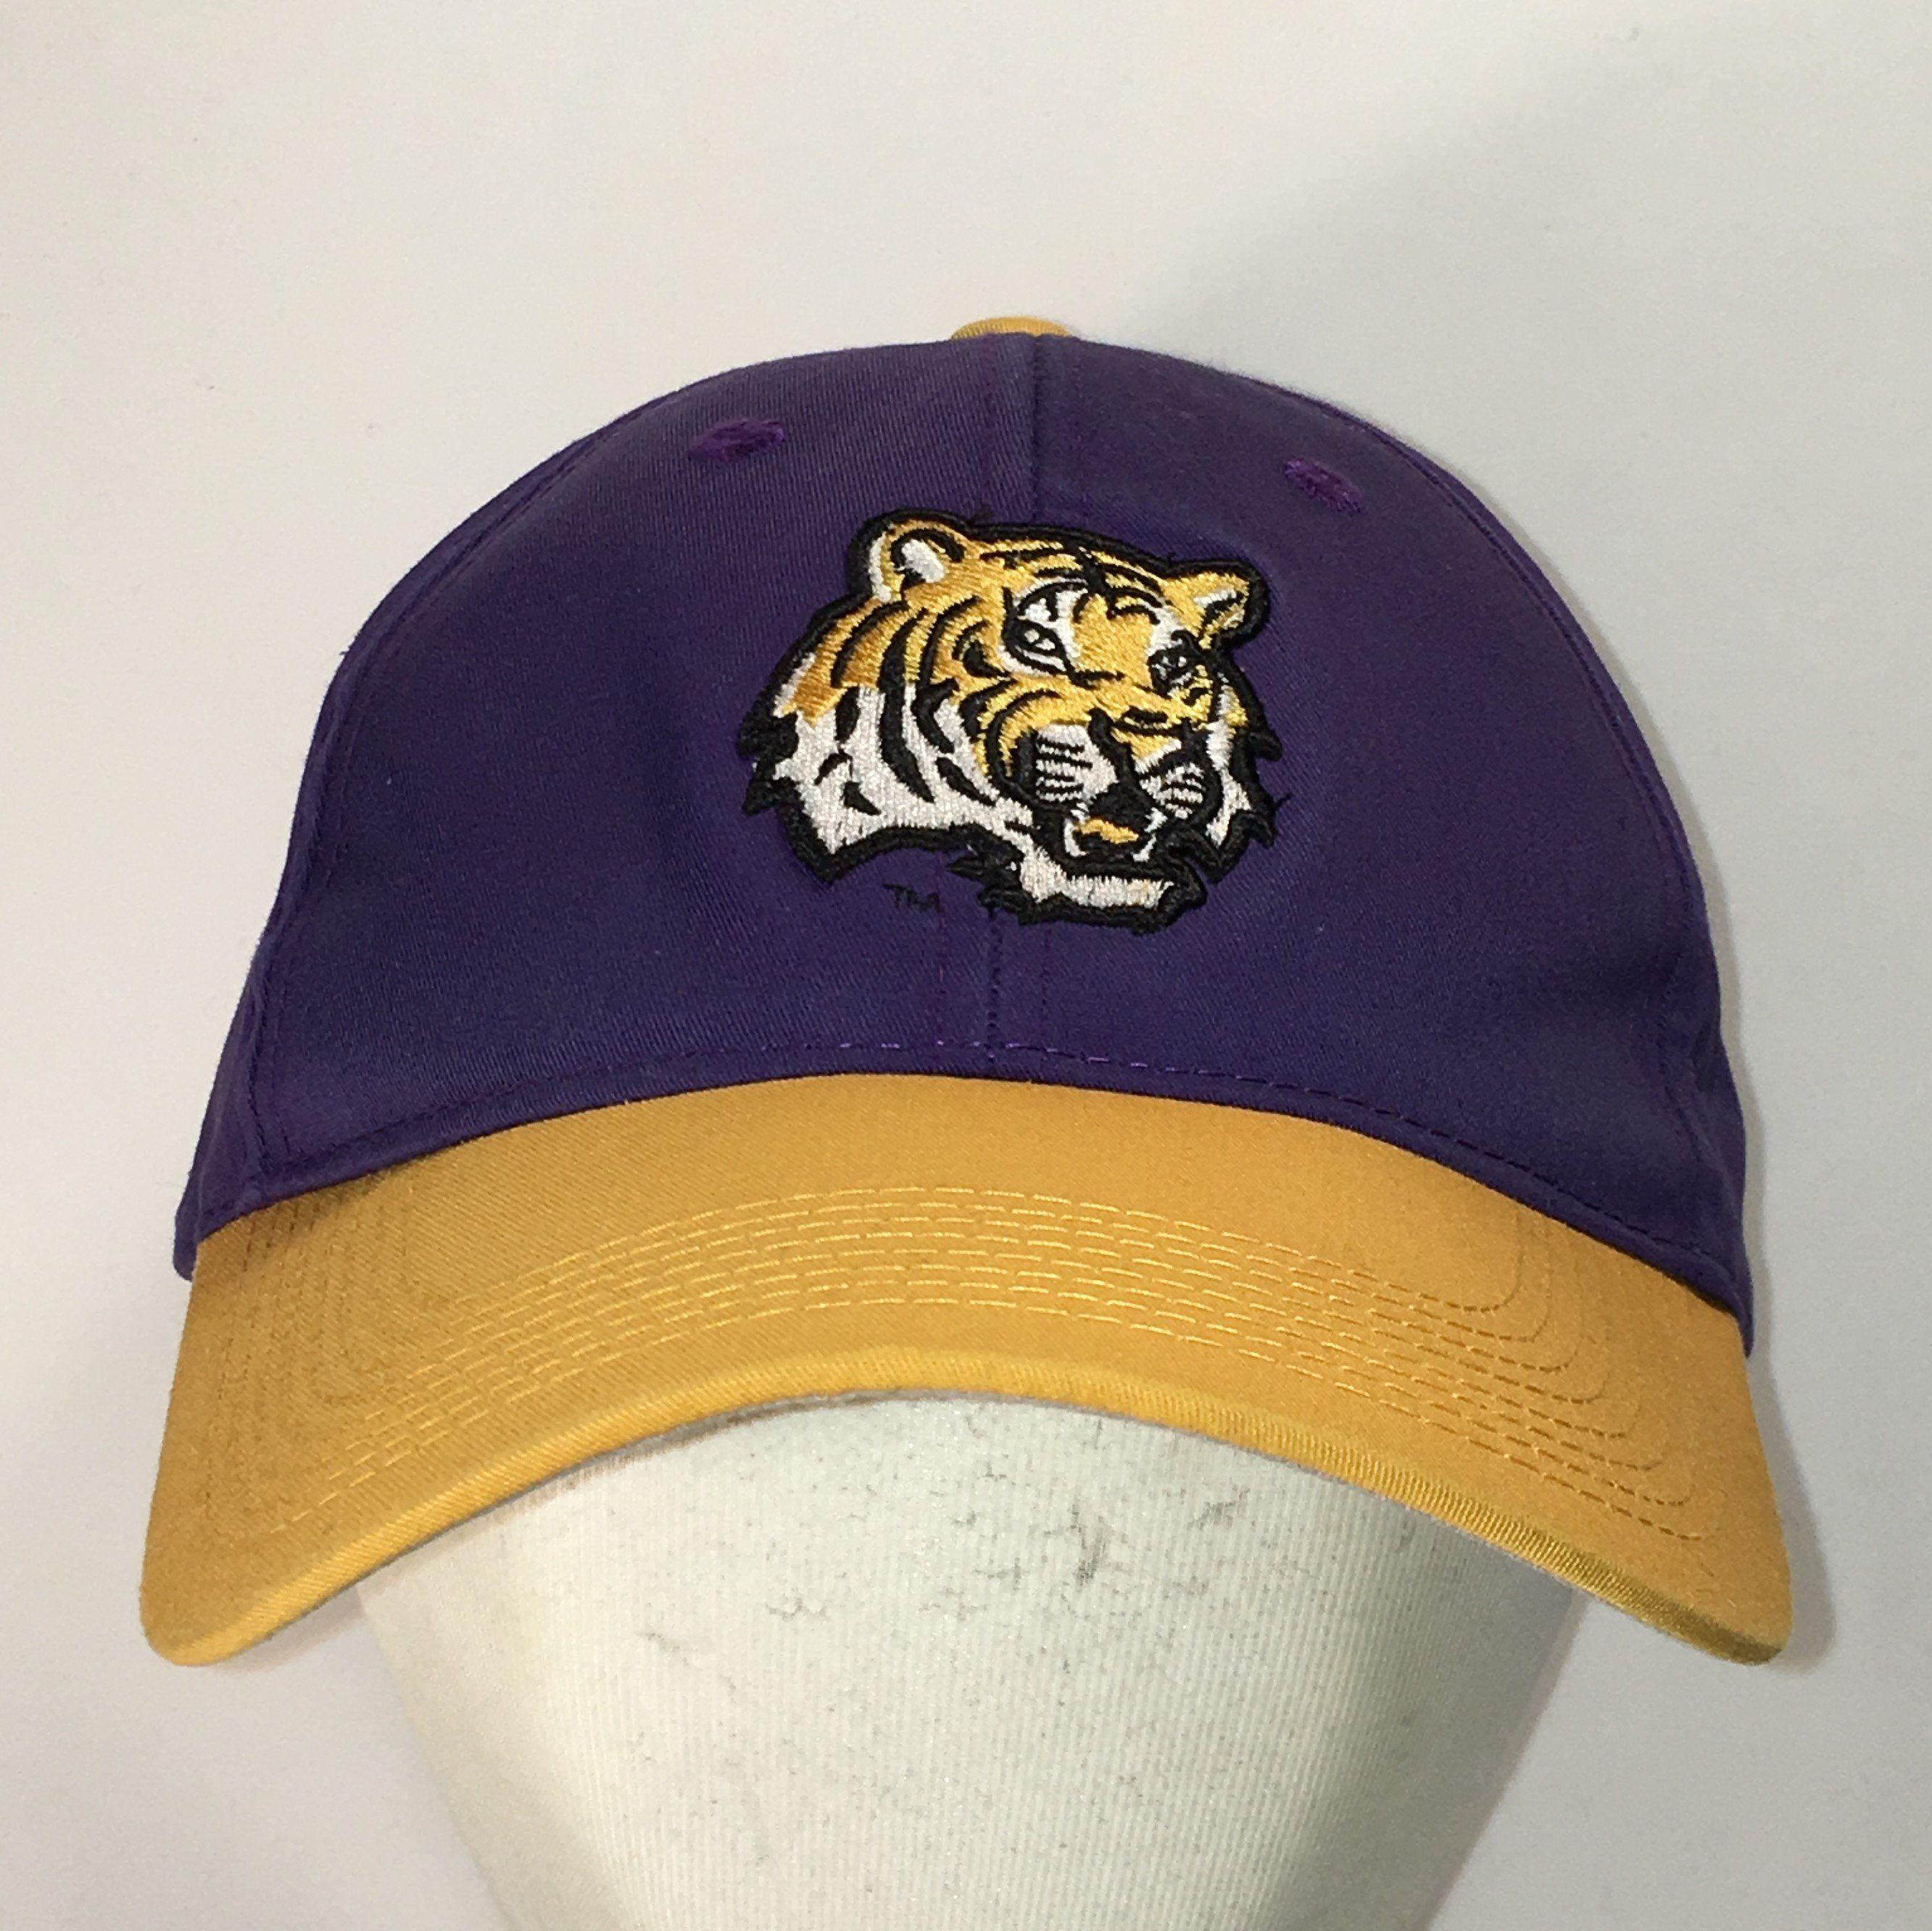 8abb8740b70 Vintage LSU Tigers Hat Purple Gold Baseball Cap Louisiana State University  NCAA College Basketball Dad Caps